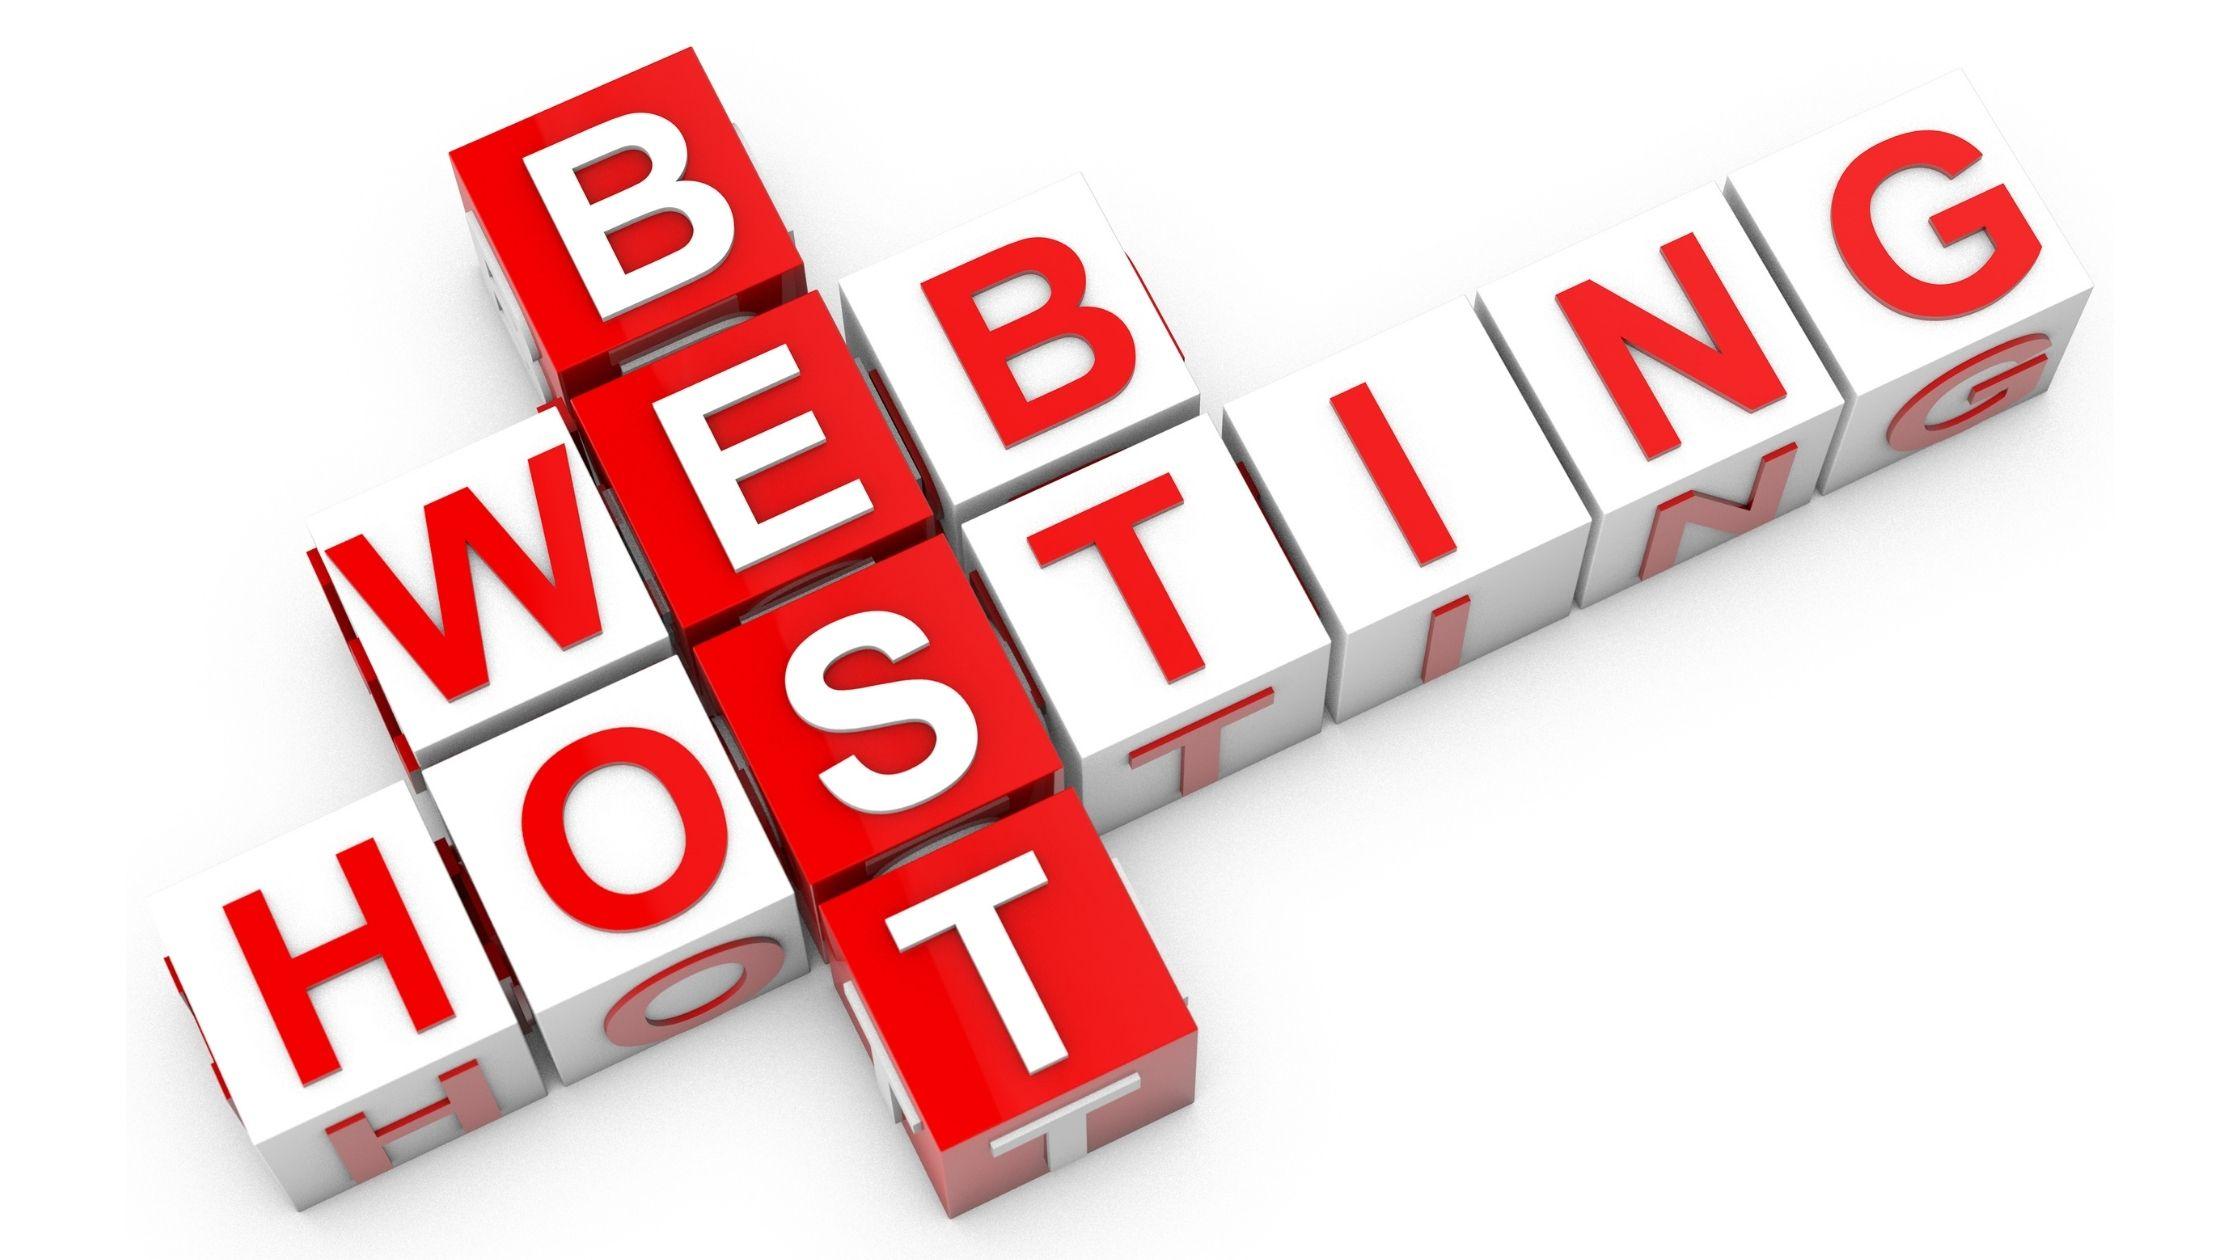 Image best web hosting for wordpress | DigitalPro